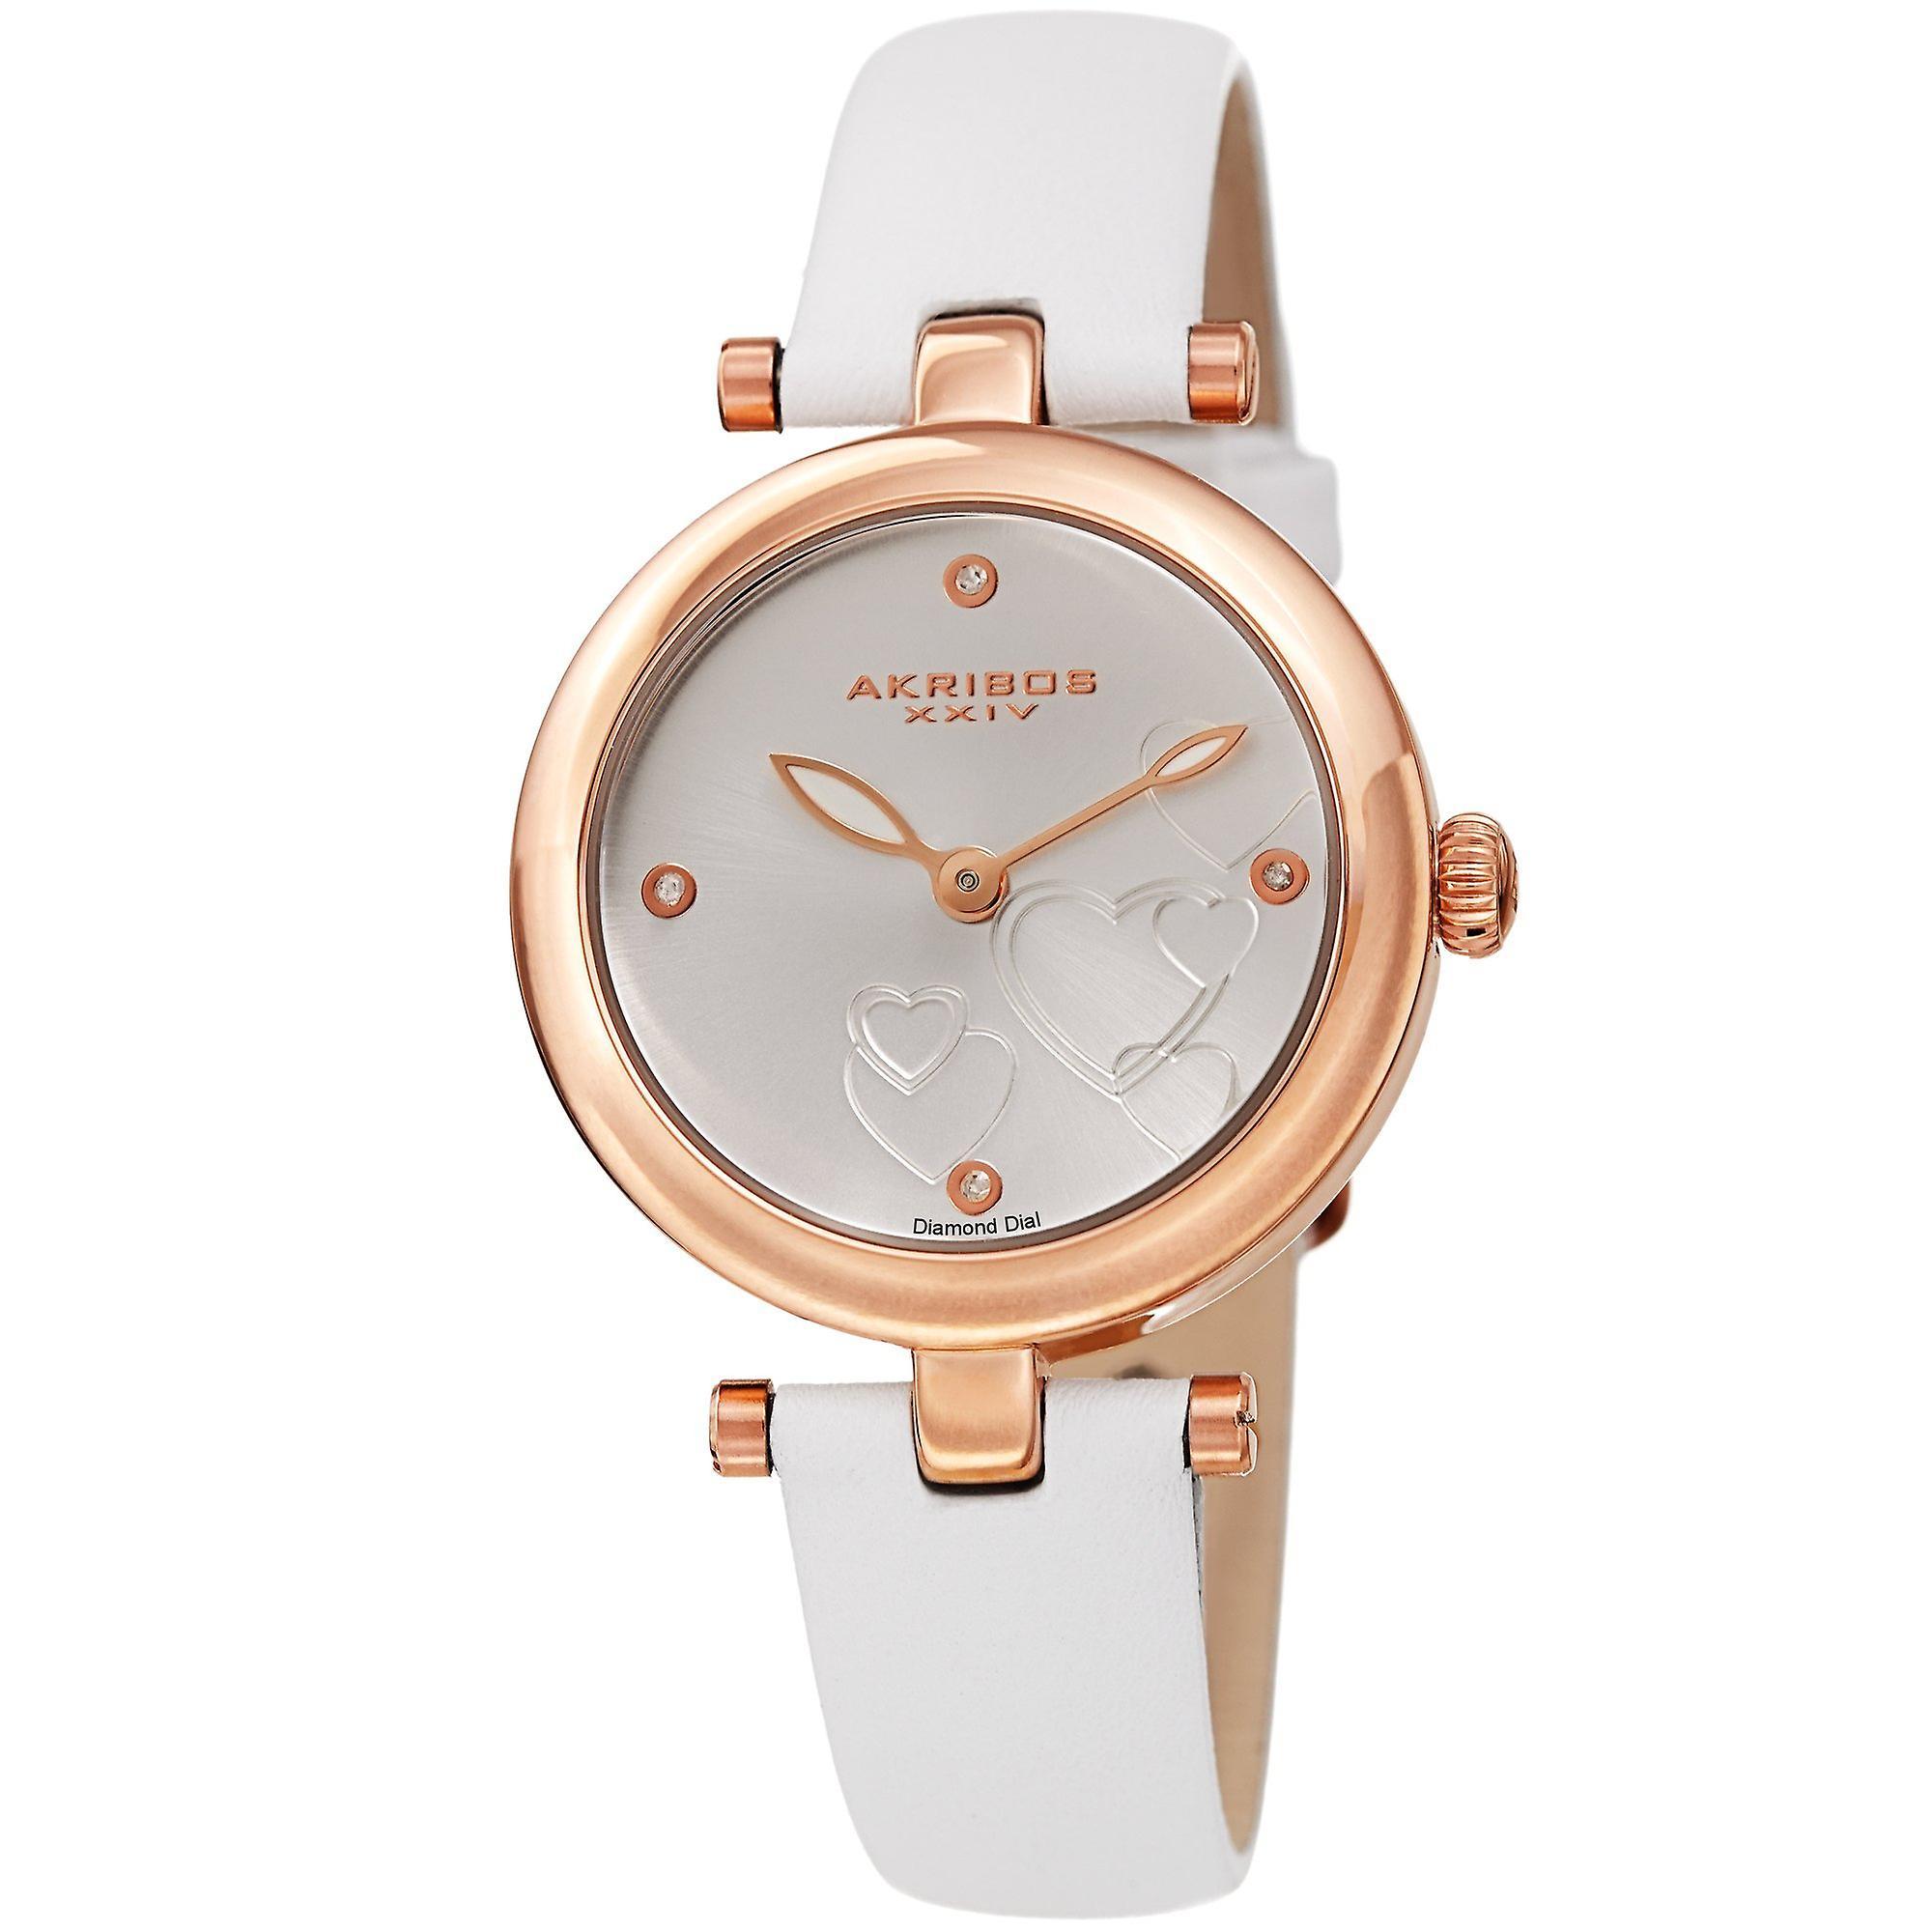 Akribos XXIV AK1044WTR Heart Embossed Diamond Marker Leather Strap Watch